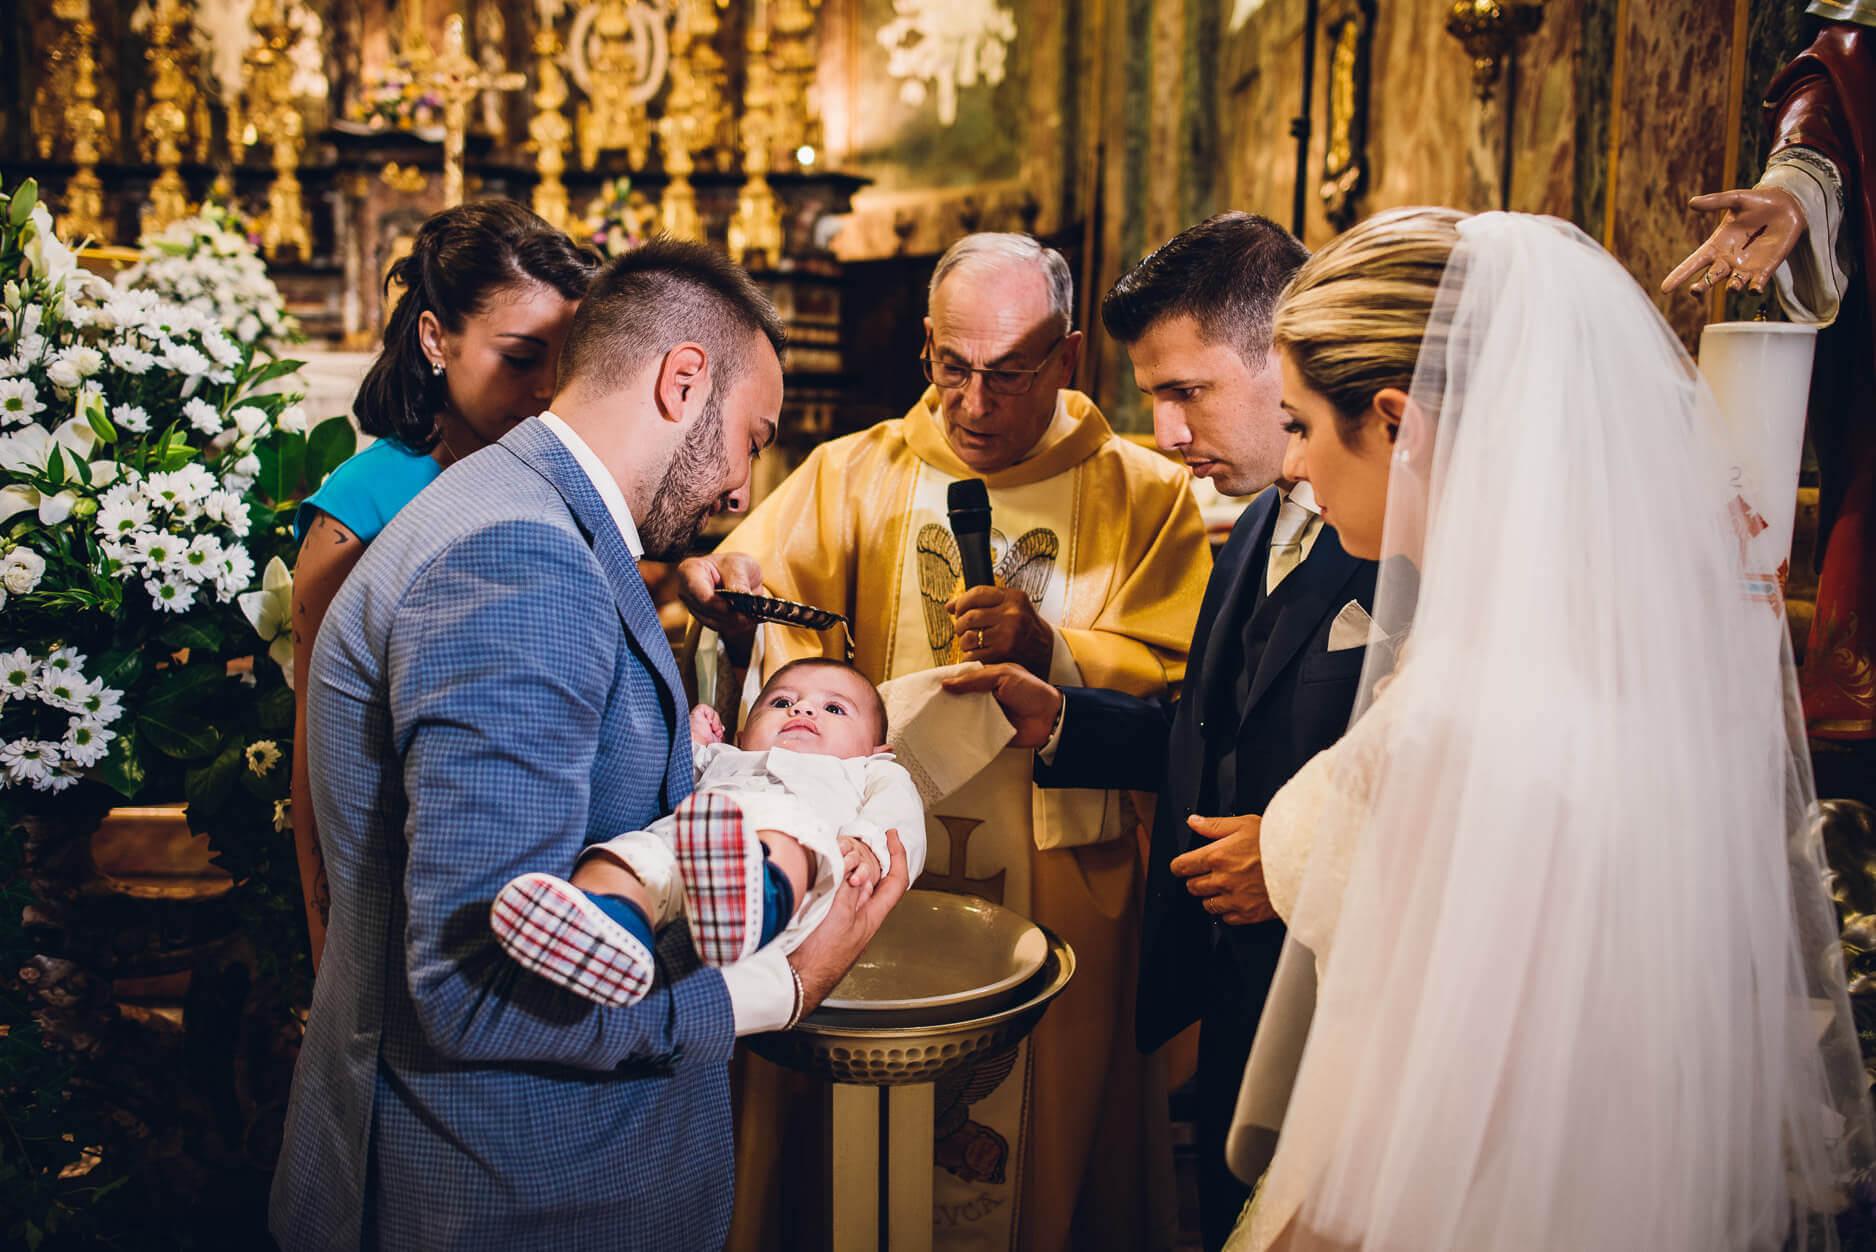 Auguri Matrimonio Non Presenti : Matrimonio e battesimo insieme: si può fare? joyphotographers magazine